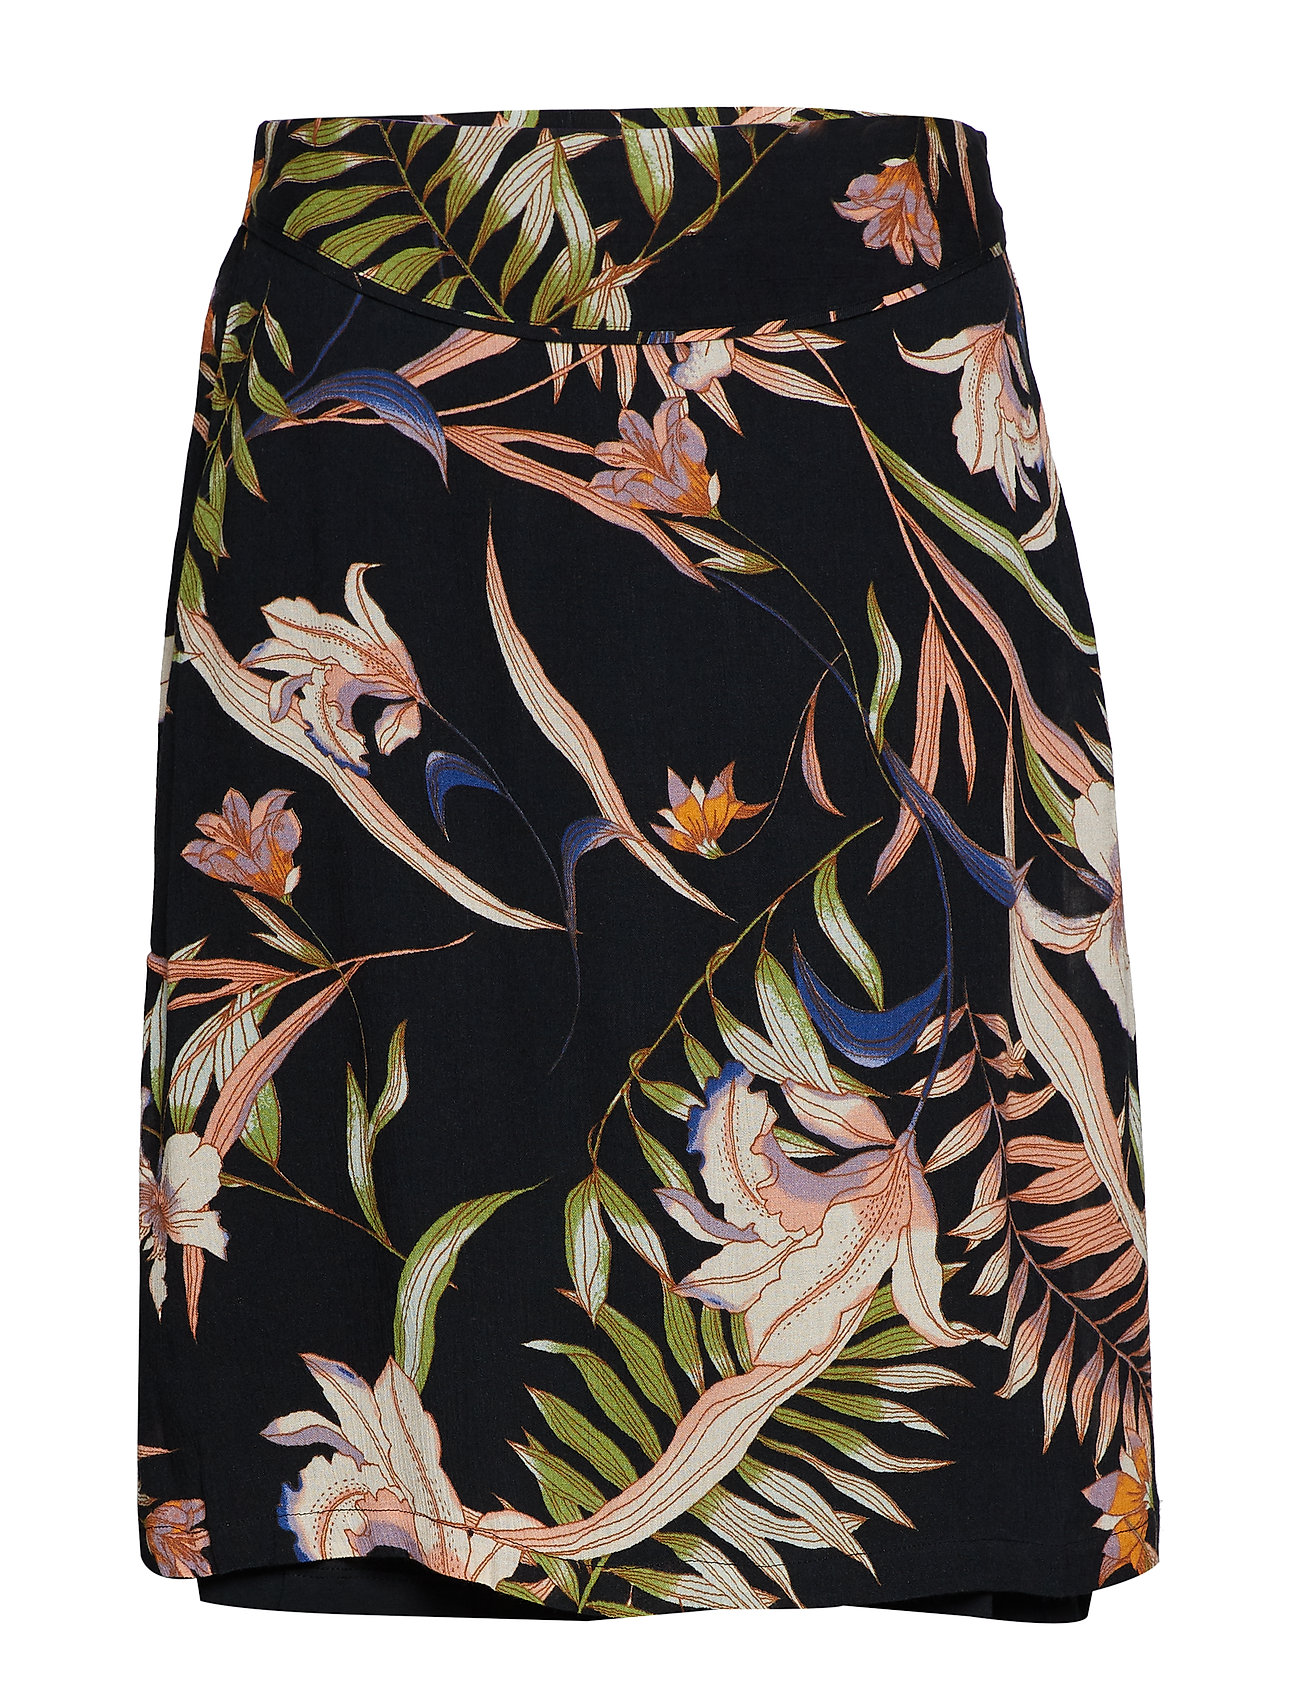 b2d66d90f80c Leann Skirt (Pitch Black) (399.20 kr) - Cream -   Boozt.com